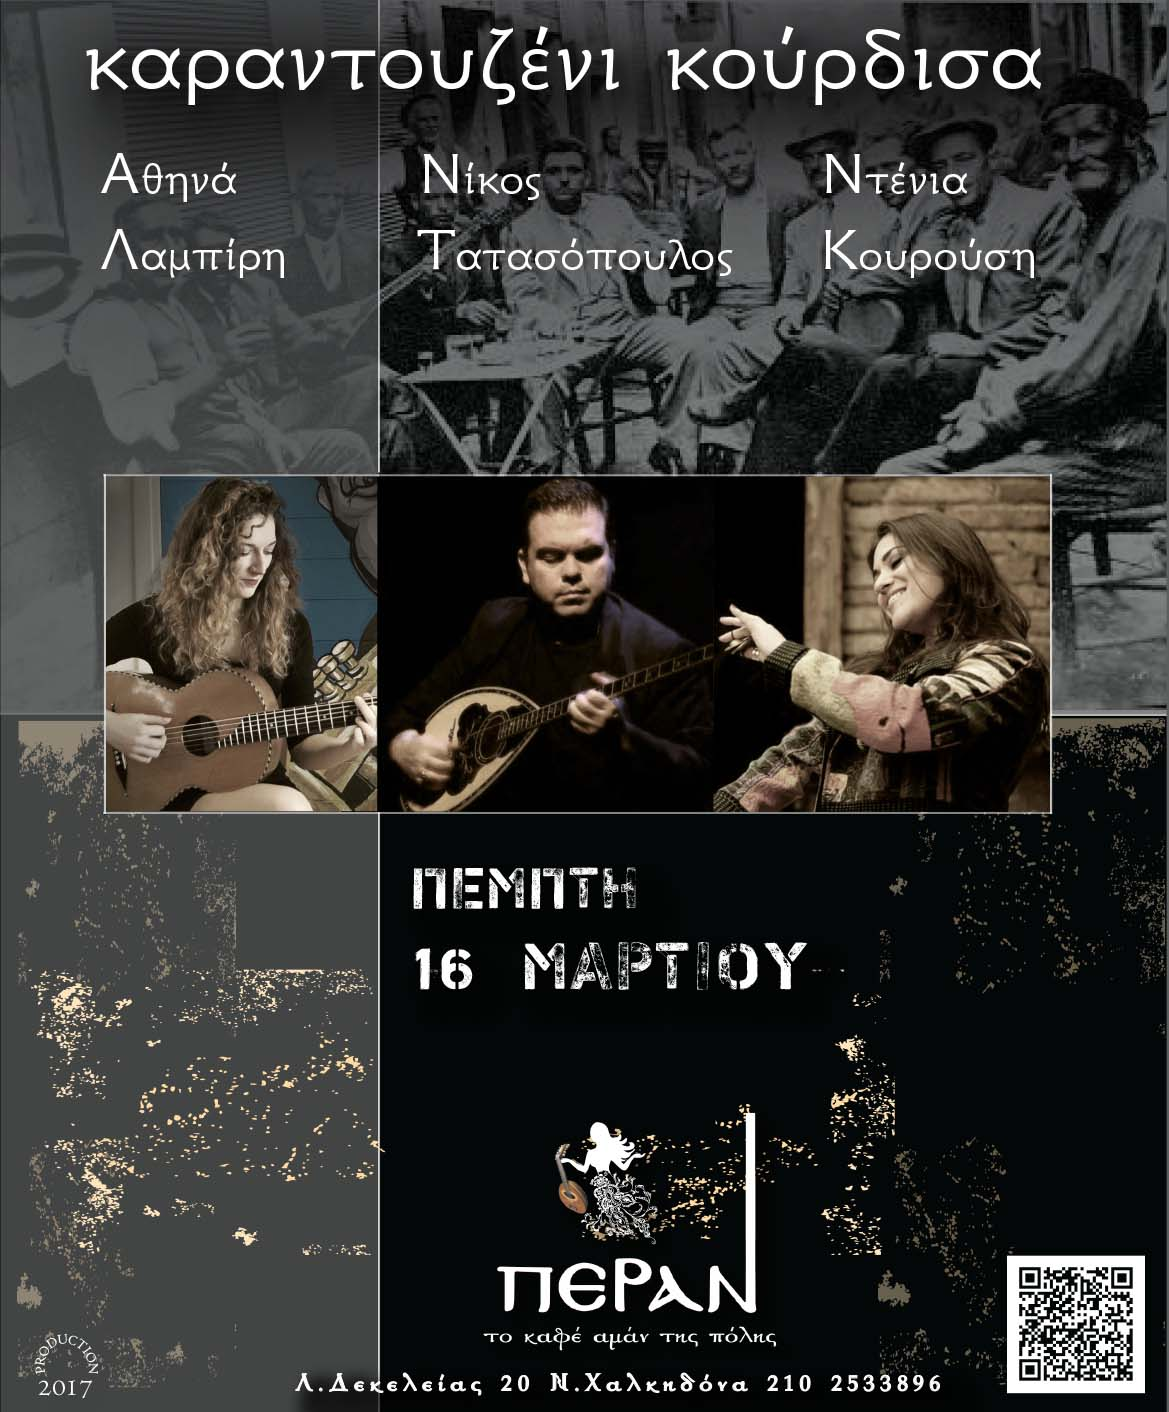 TATASOPOYLOS- KOYROYSI 16-3